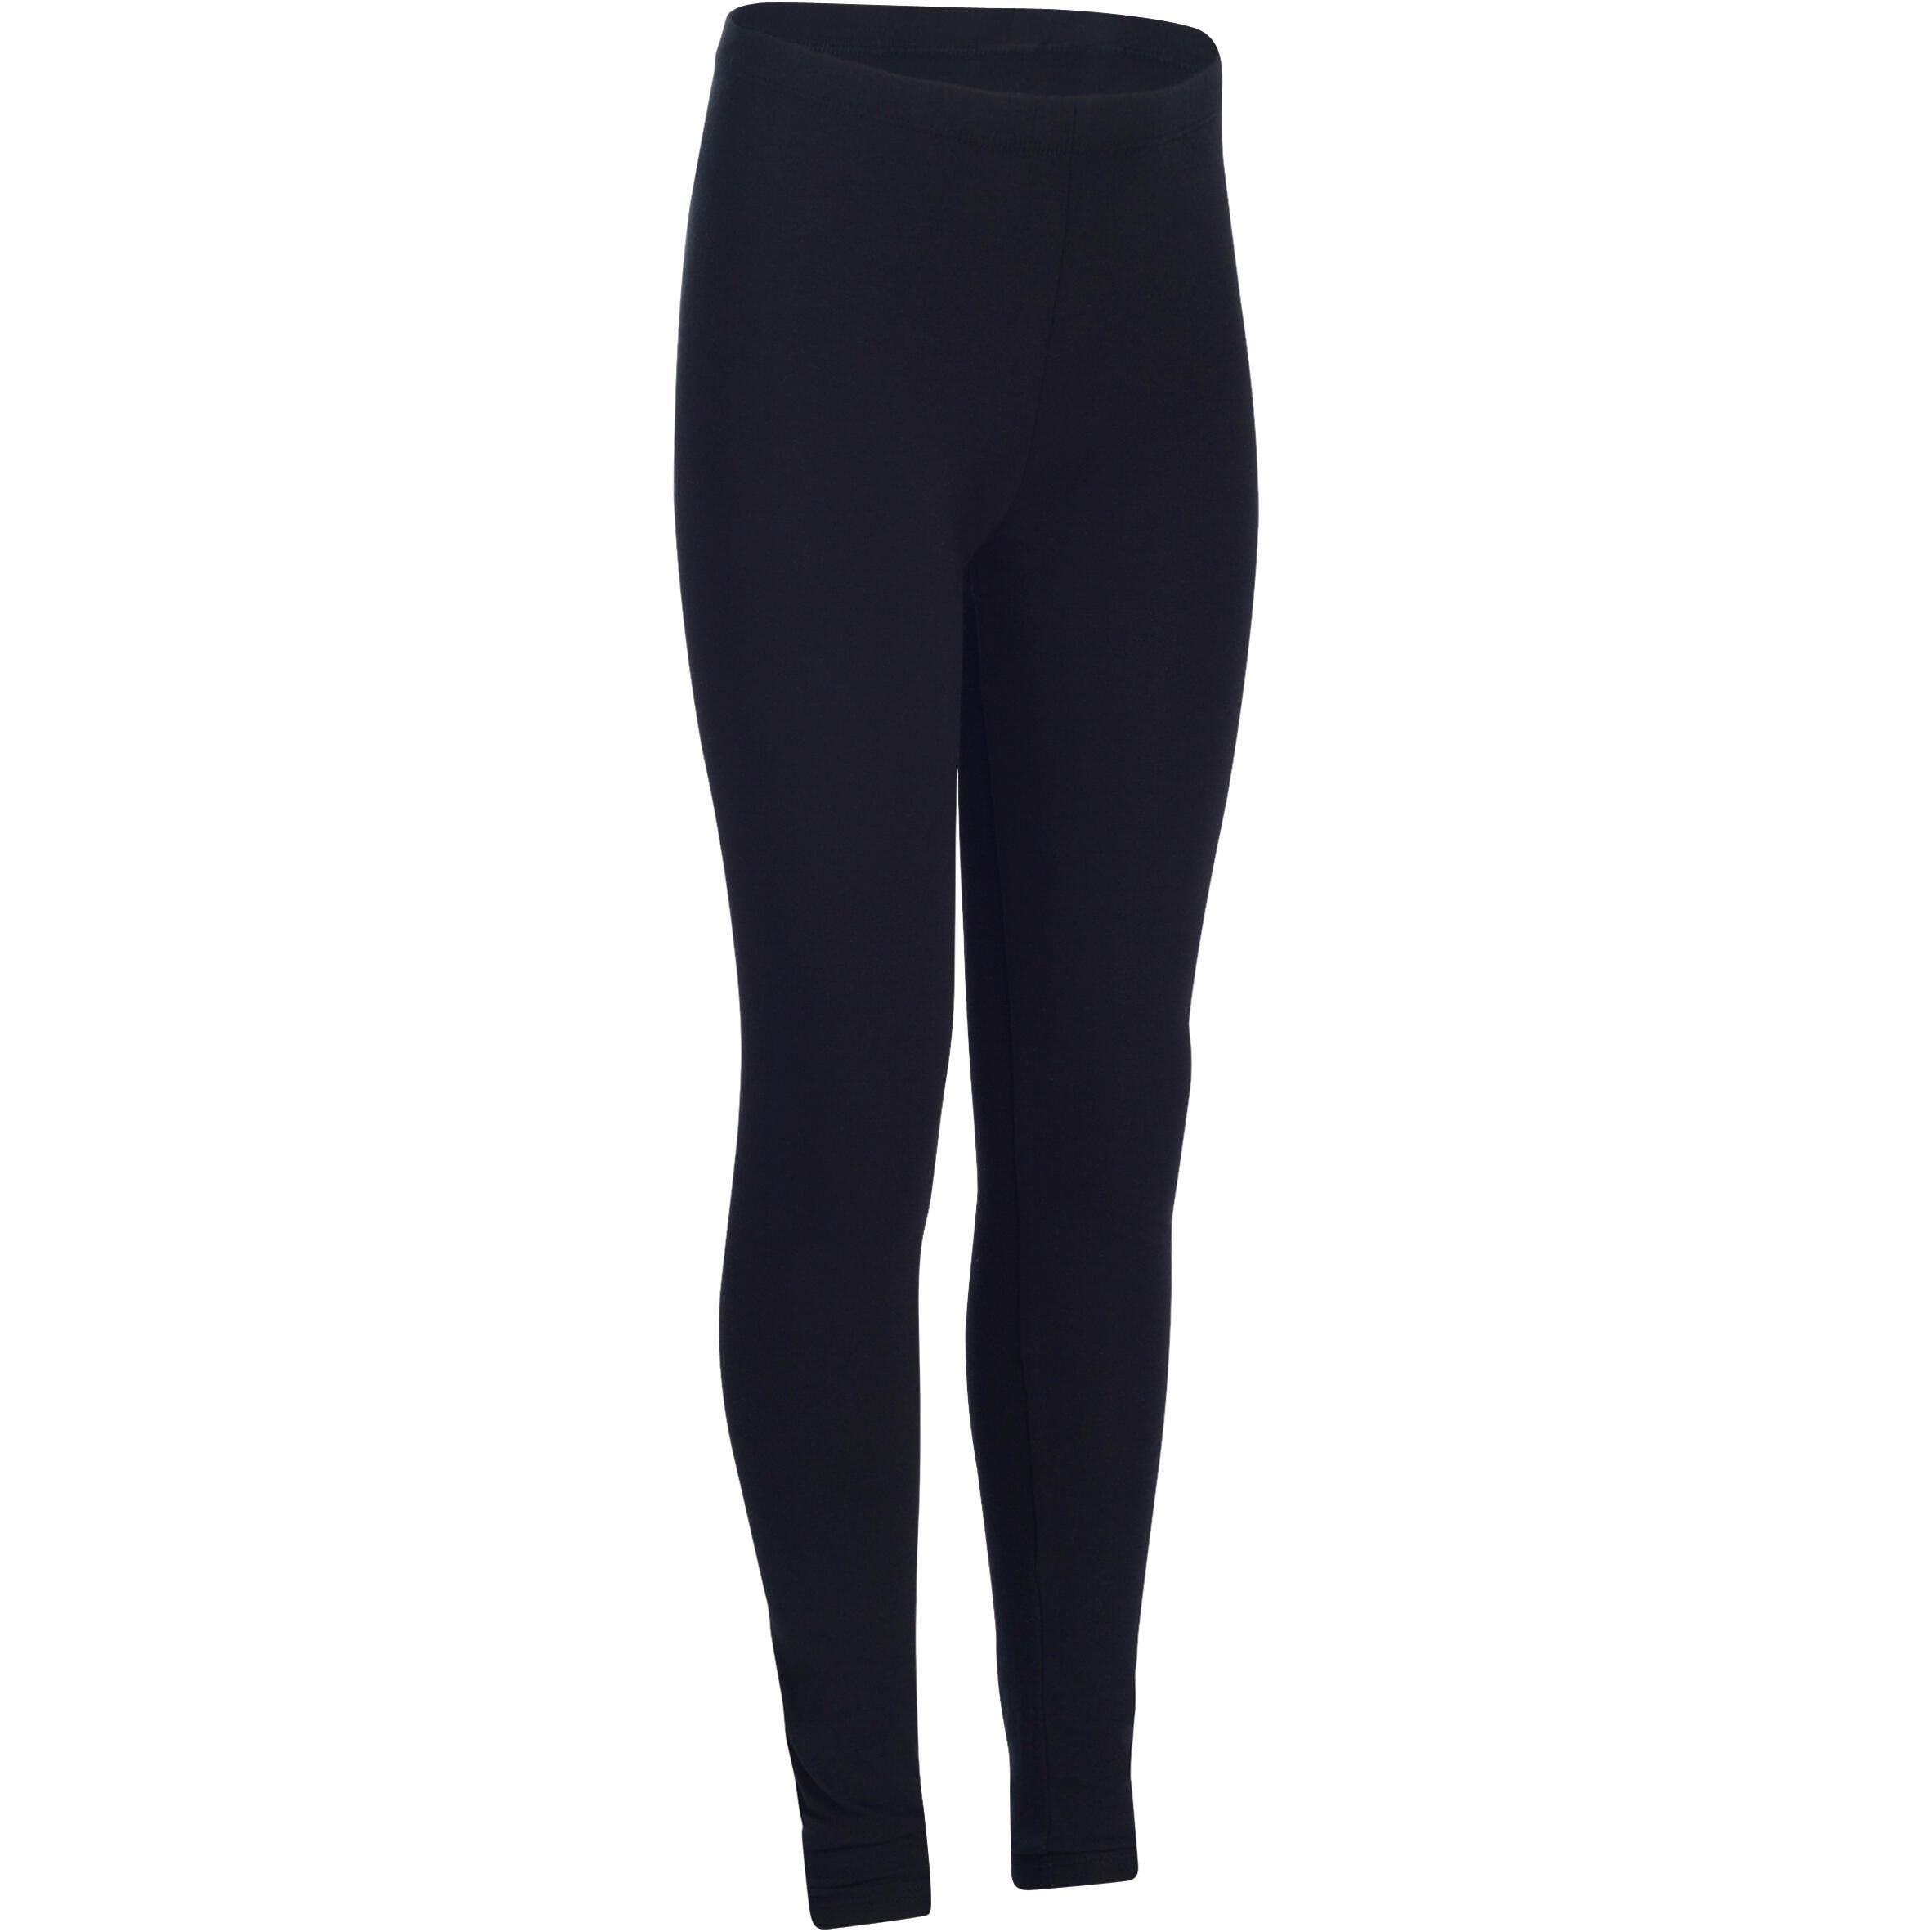 Girls' Gym Leggings 100 - Black